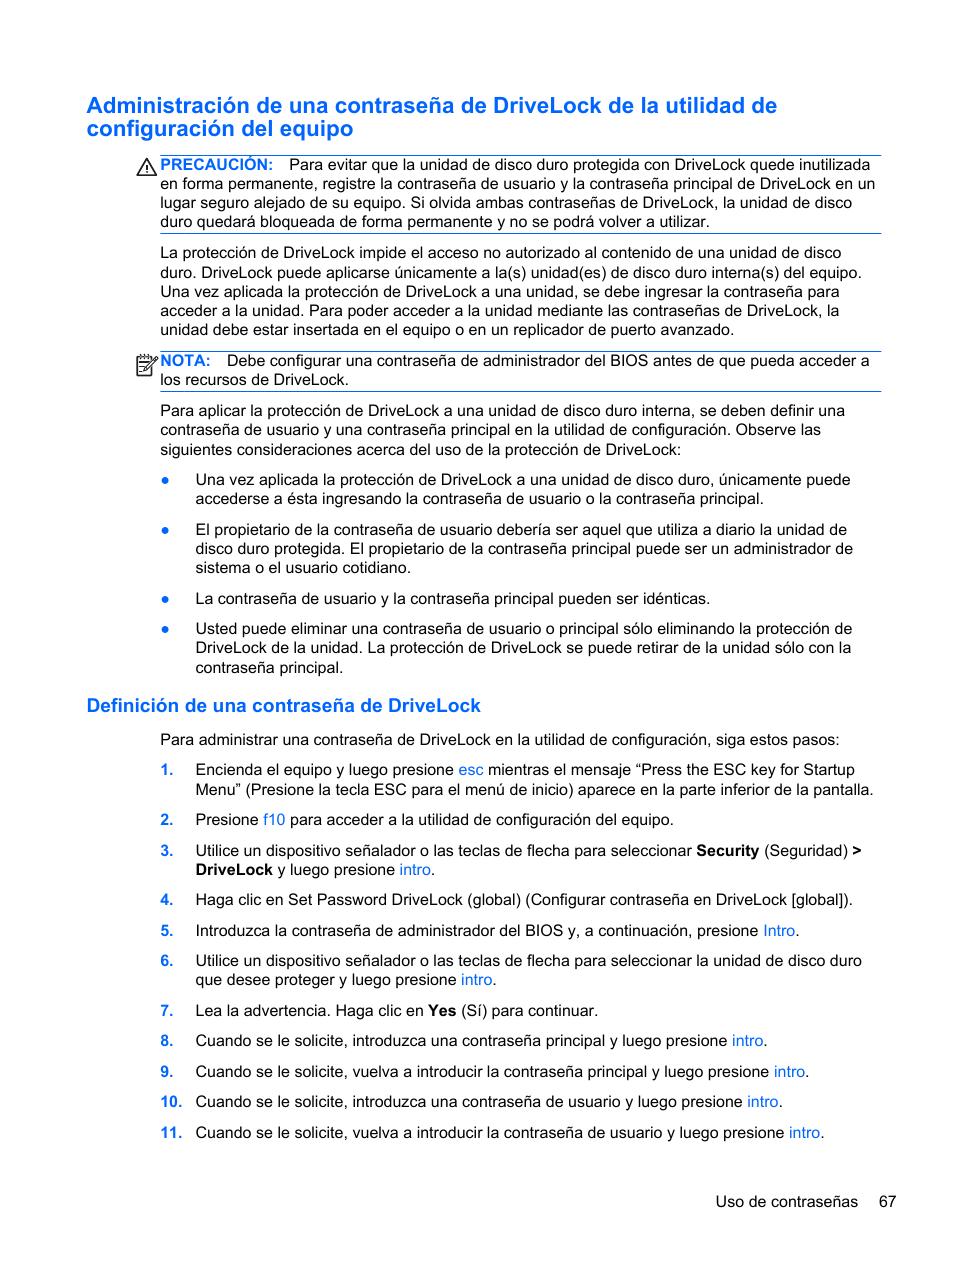 definici n de una contrase a de drivelock hp estaci n de trabajo rh pdfmanuales com manual de usuario web definicion manual de usuario definicion informatica